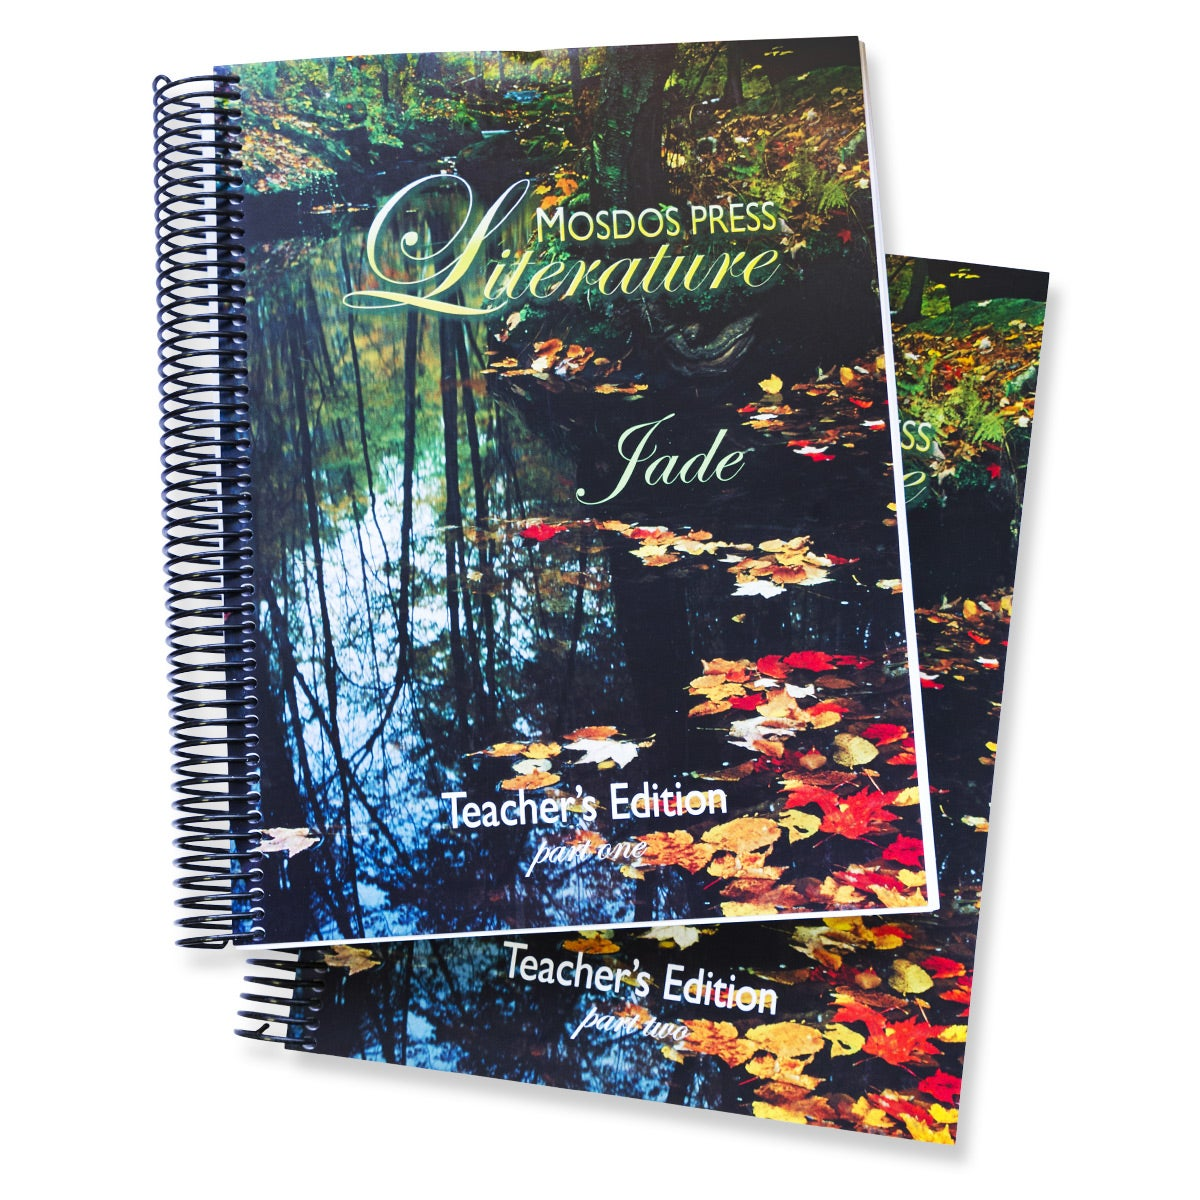 Image of 7th Grade-Teachers Edition-Mosdos Press Jade